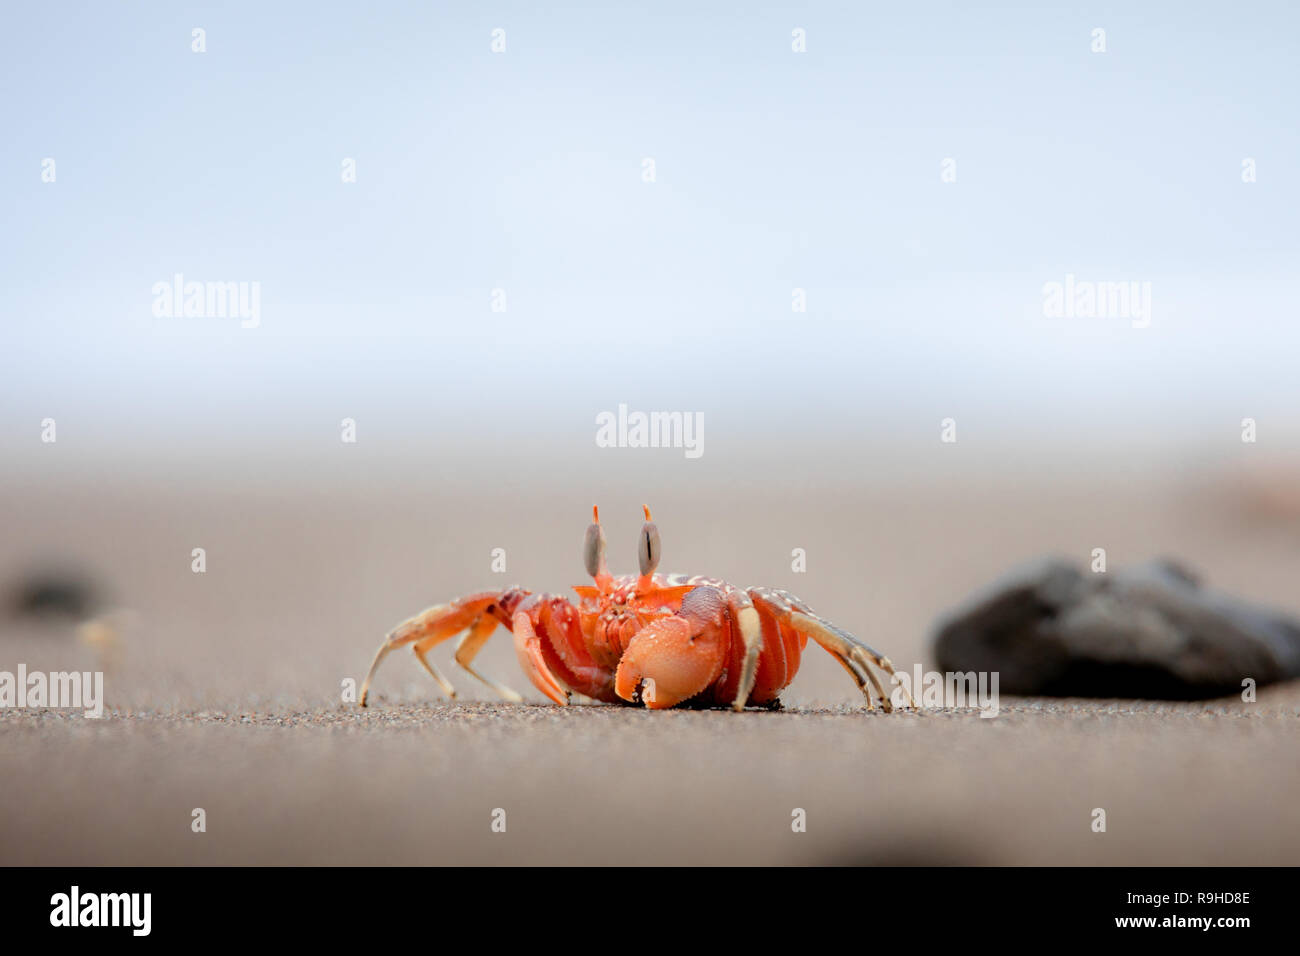 Red ghost crab cangrejo fantasma rojo Isla de la Plata Ecuador Immagini Stock